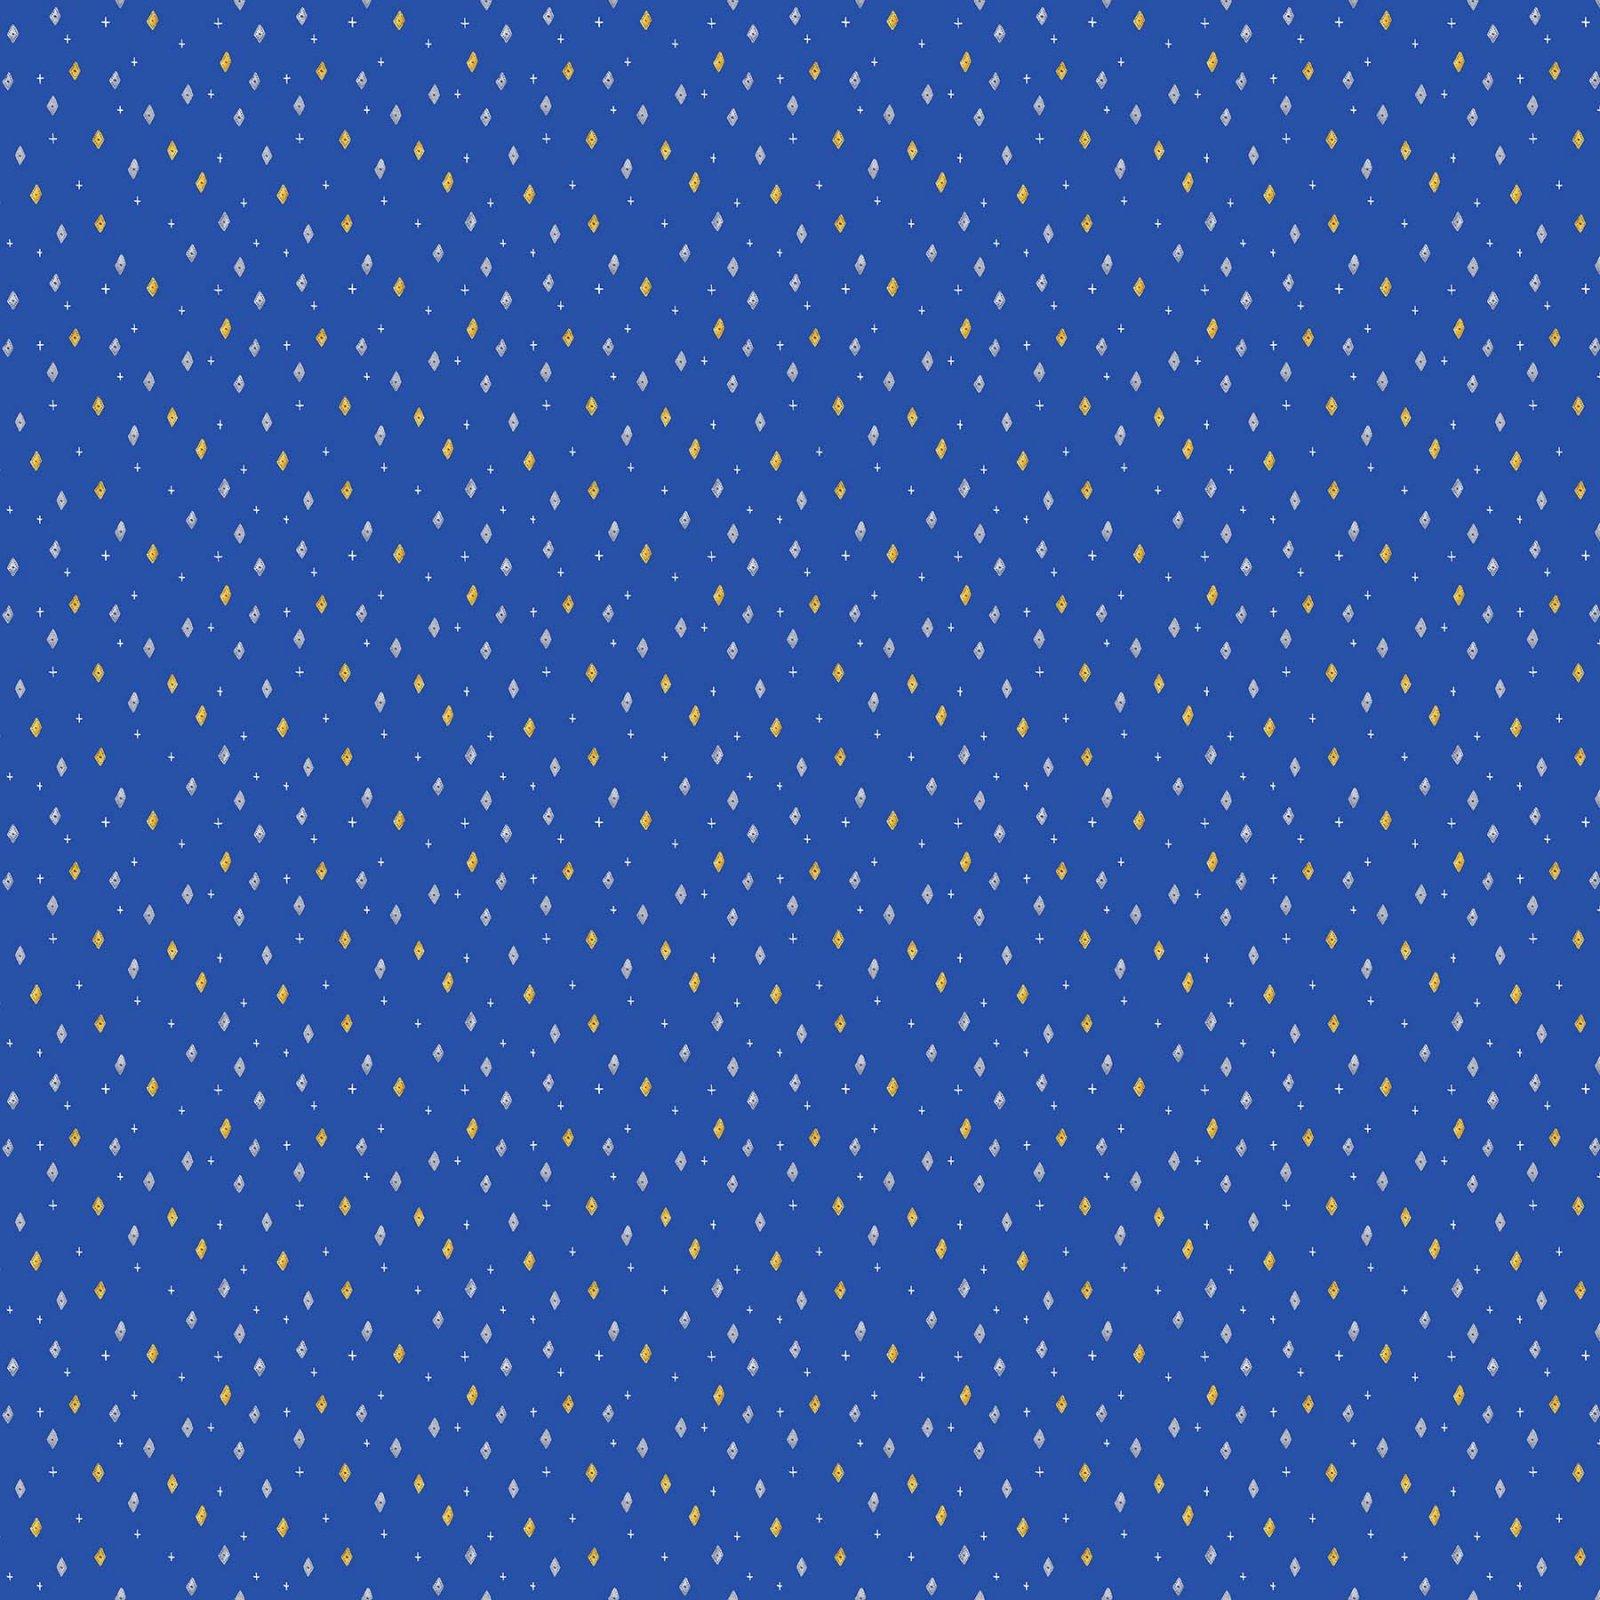 90034/42 Blue: Eloise's Garden (Abigail Halpin)